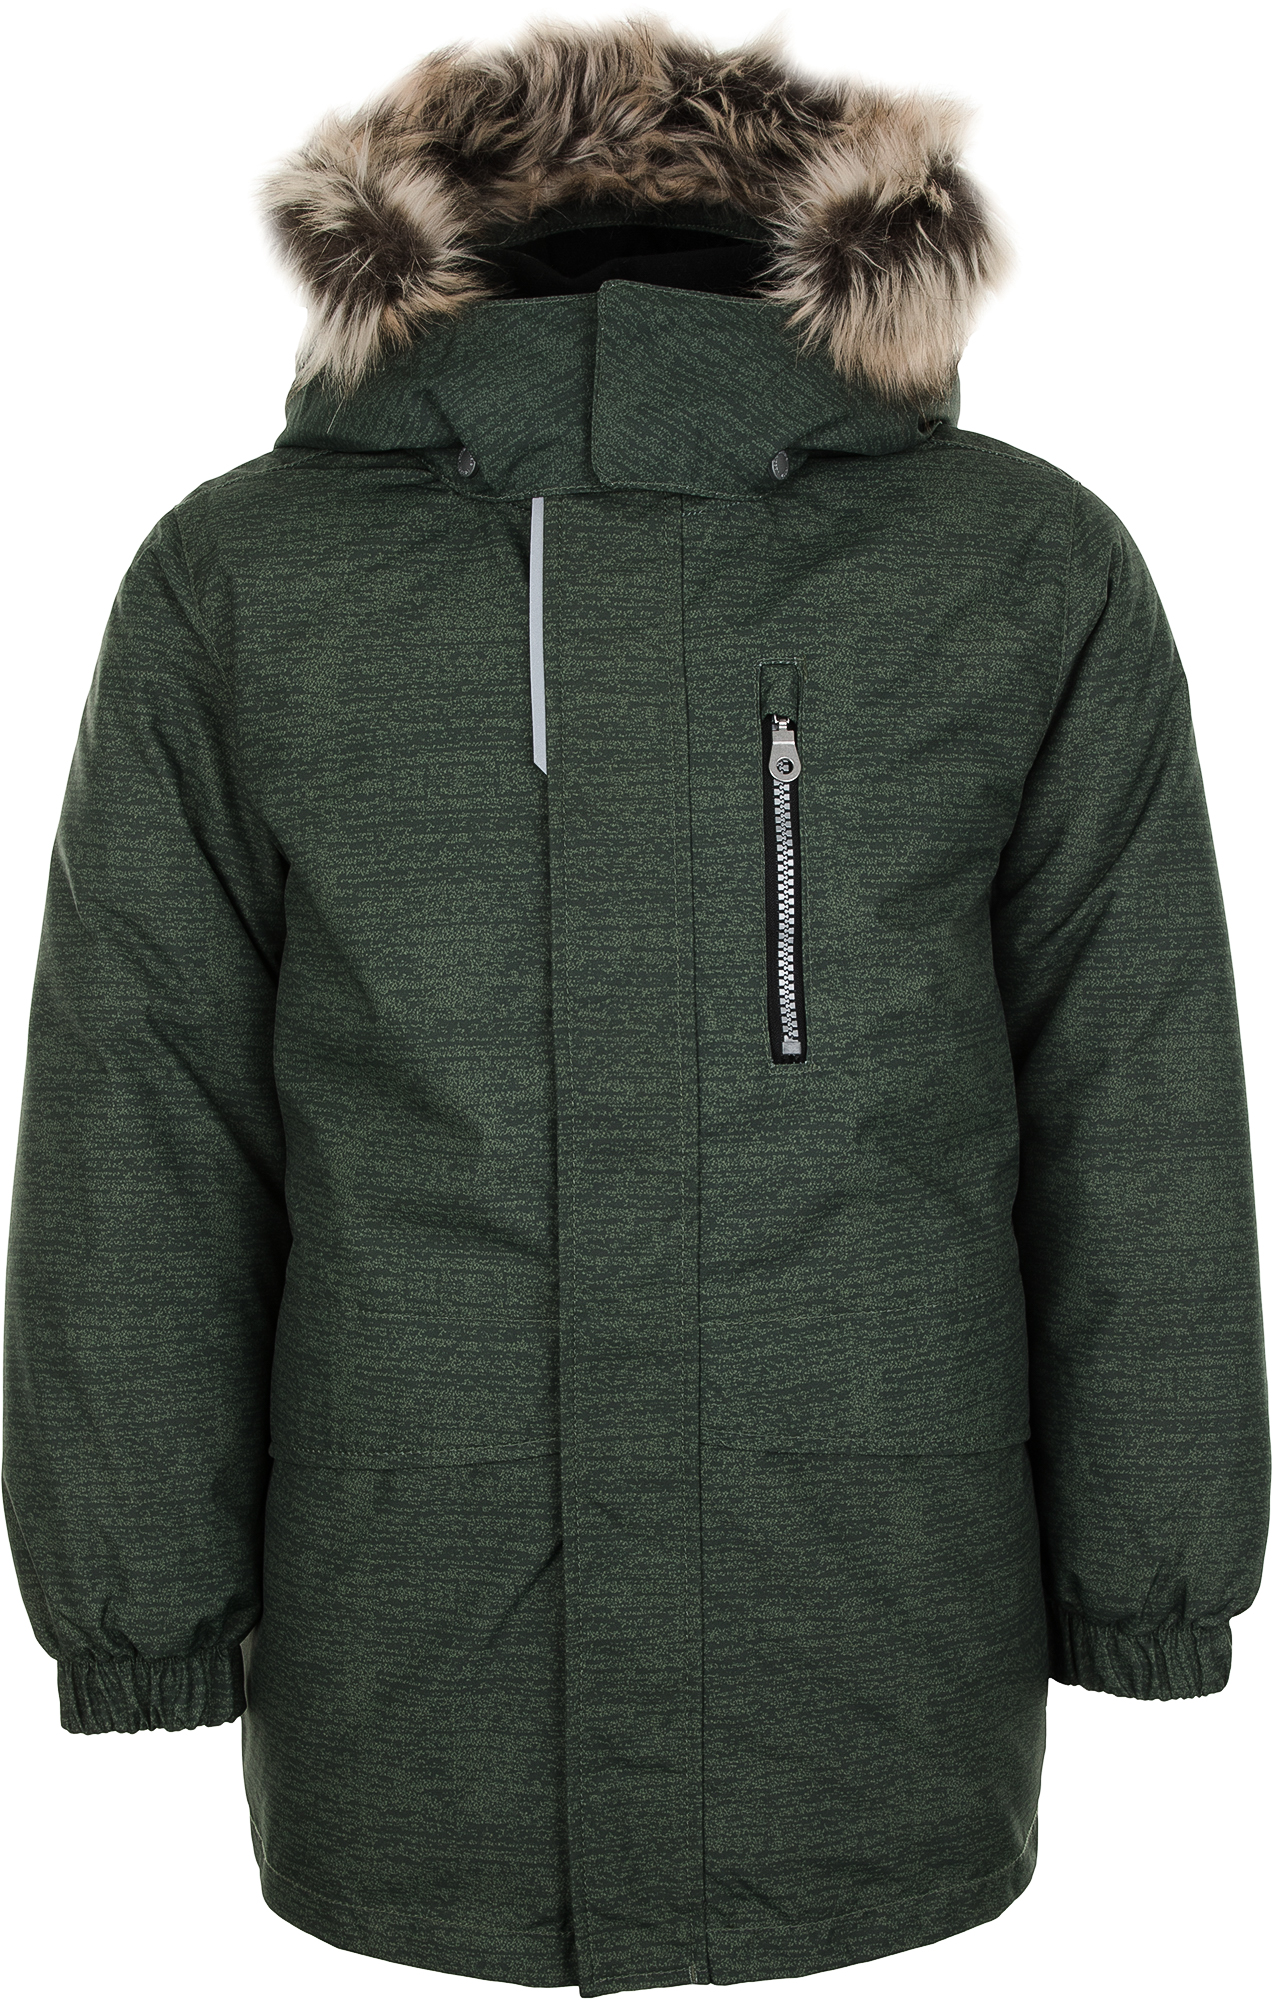 цена на Lassie Куртка утепленная для мальчиков LASSIE Yanis, размер 134